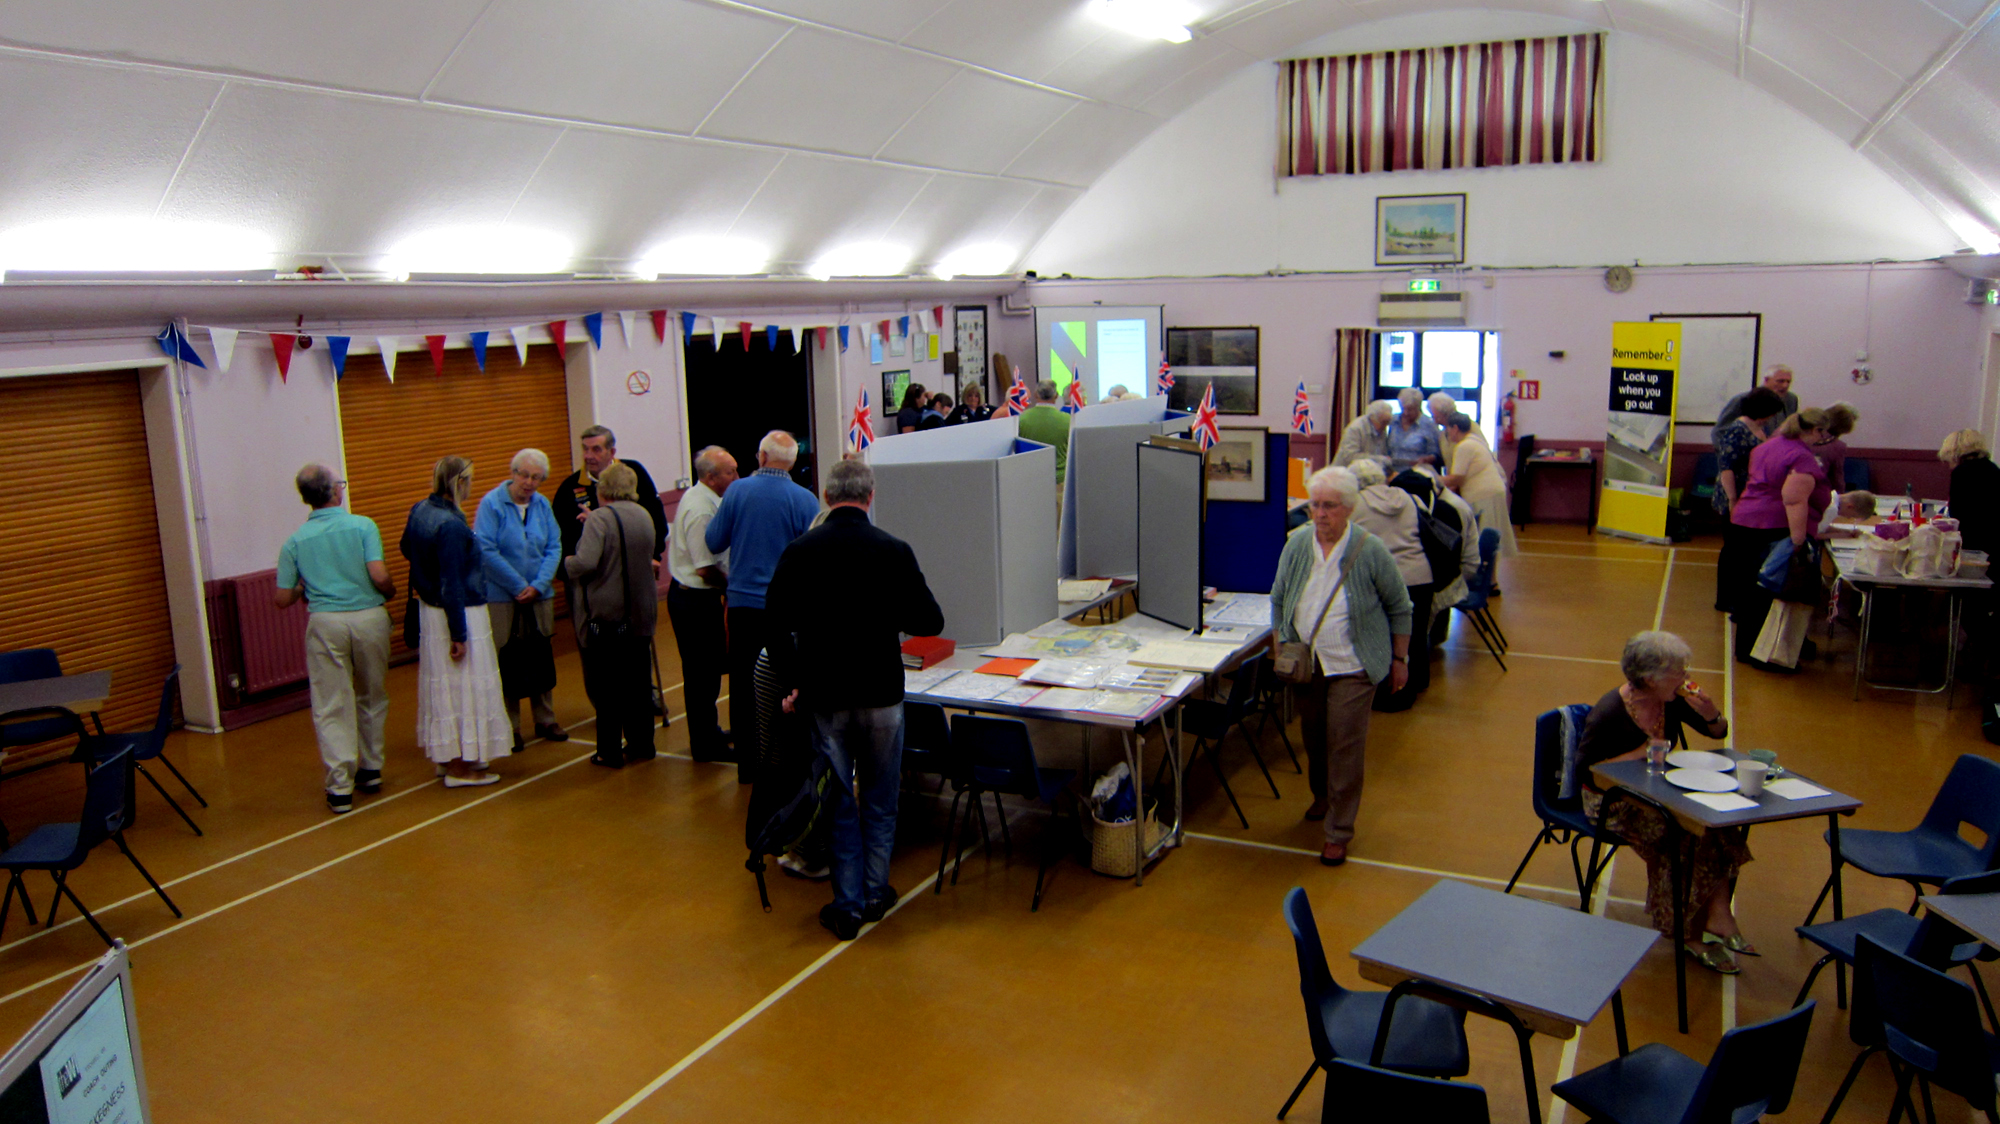 parish-hall-visitors